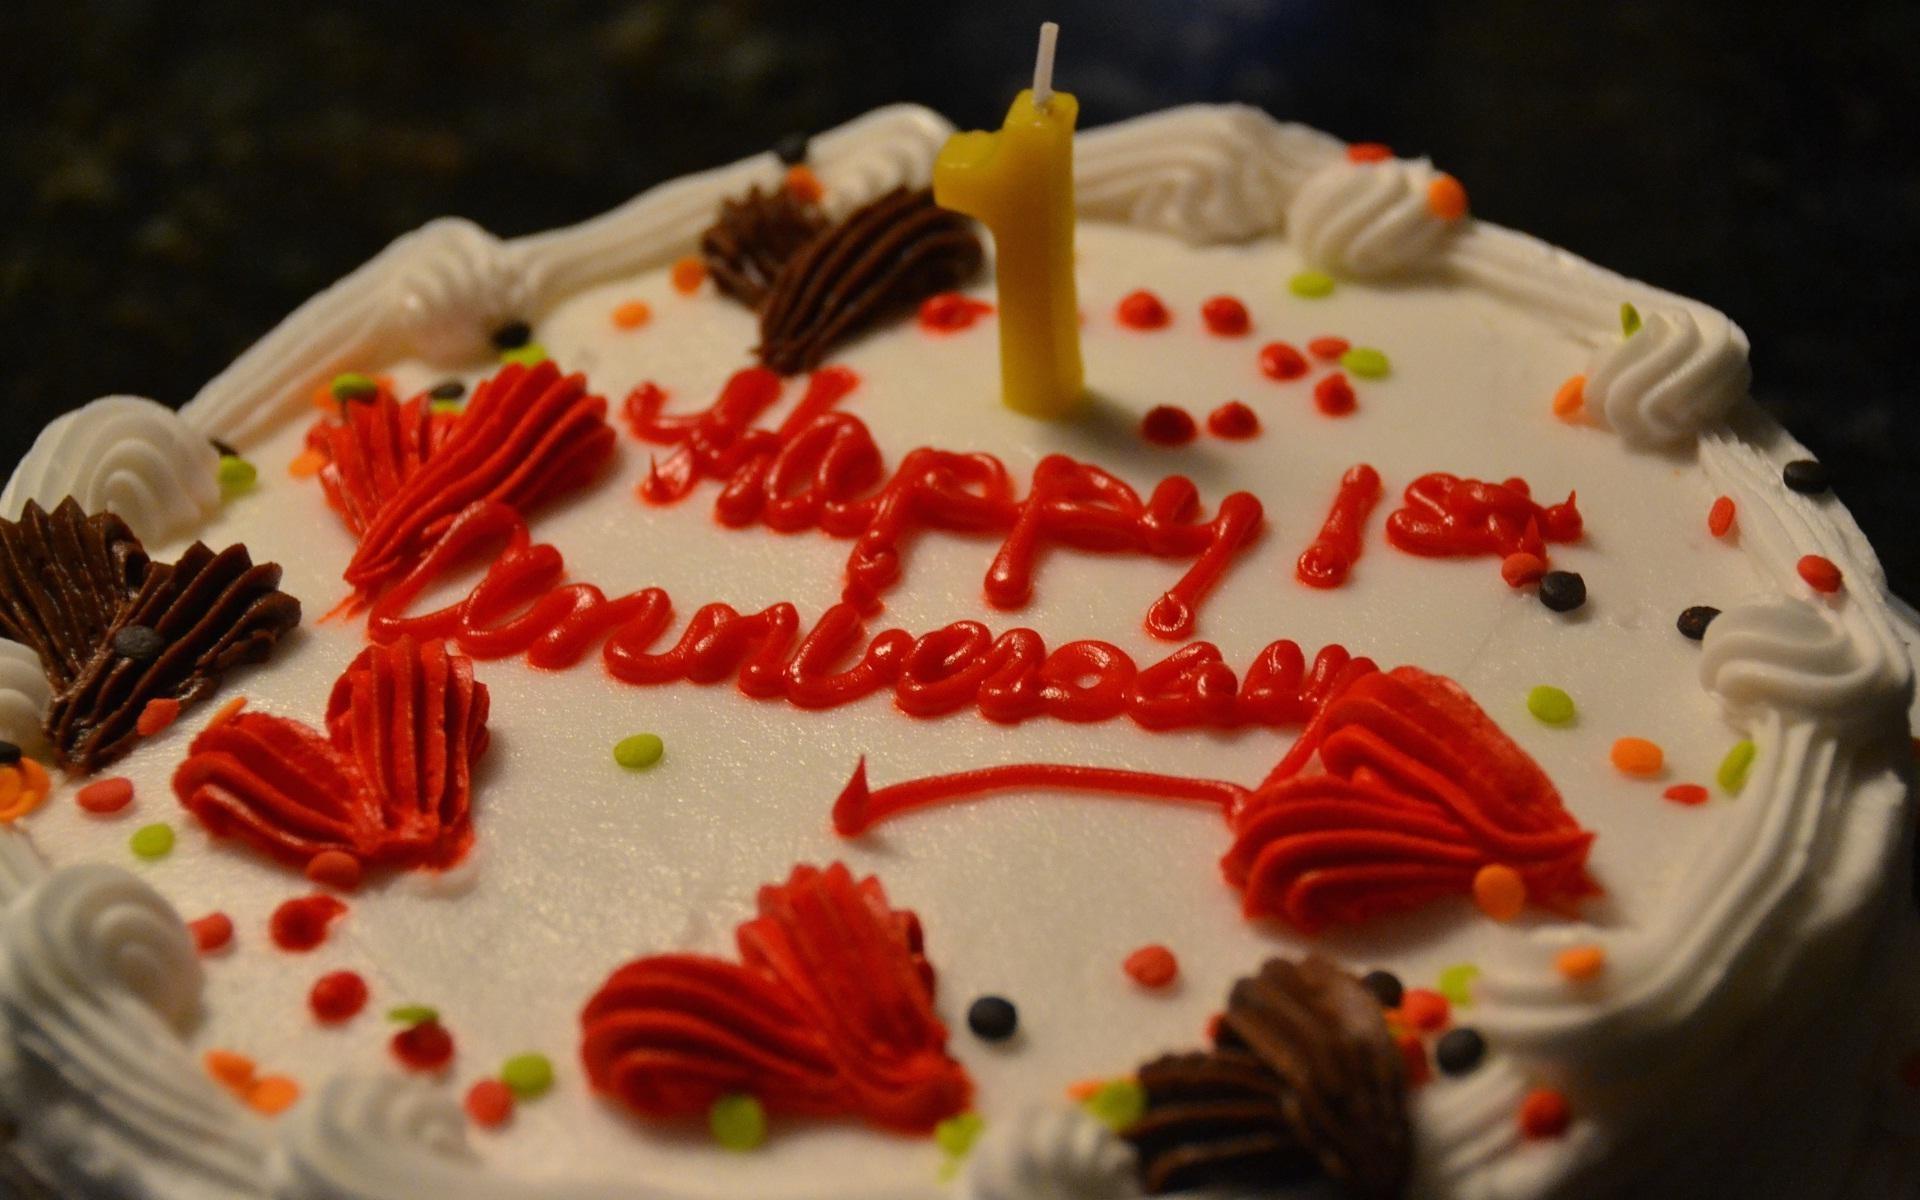 happy anniversary cake image free download